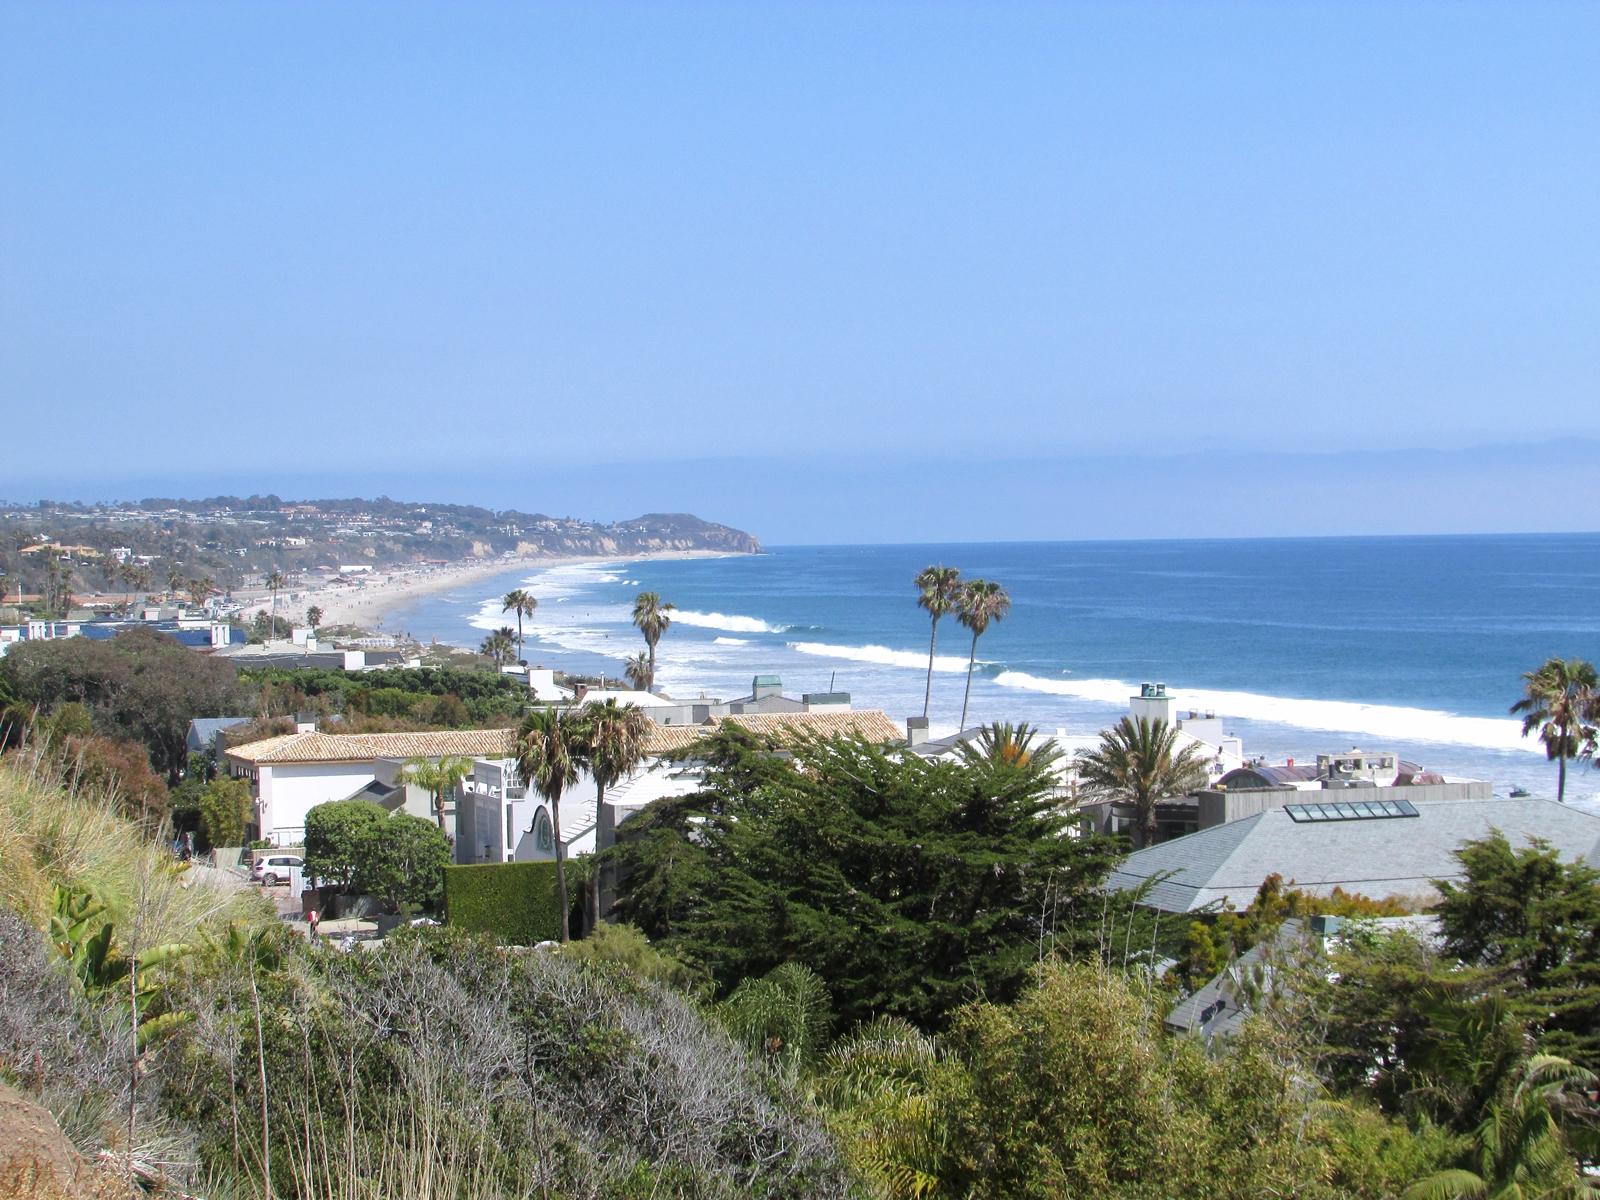 USA Rundreise - Amerika Westküste - Malibu Beach - Fashionladyloves by Tamara Wagner